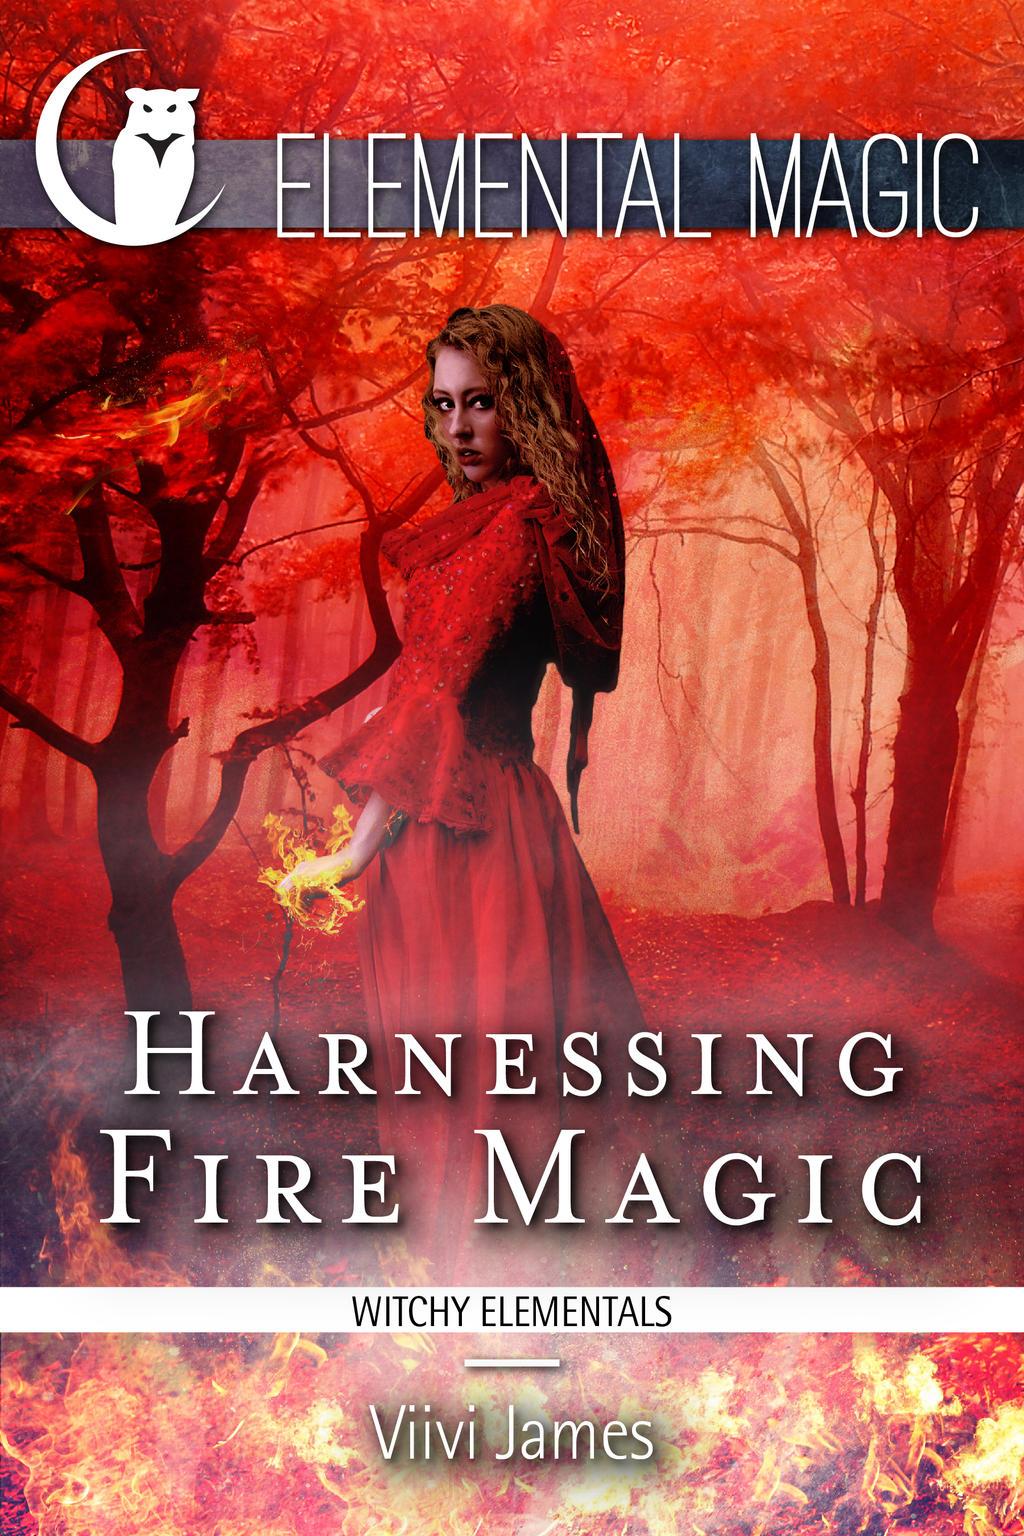 Harnessing Fire Magic